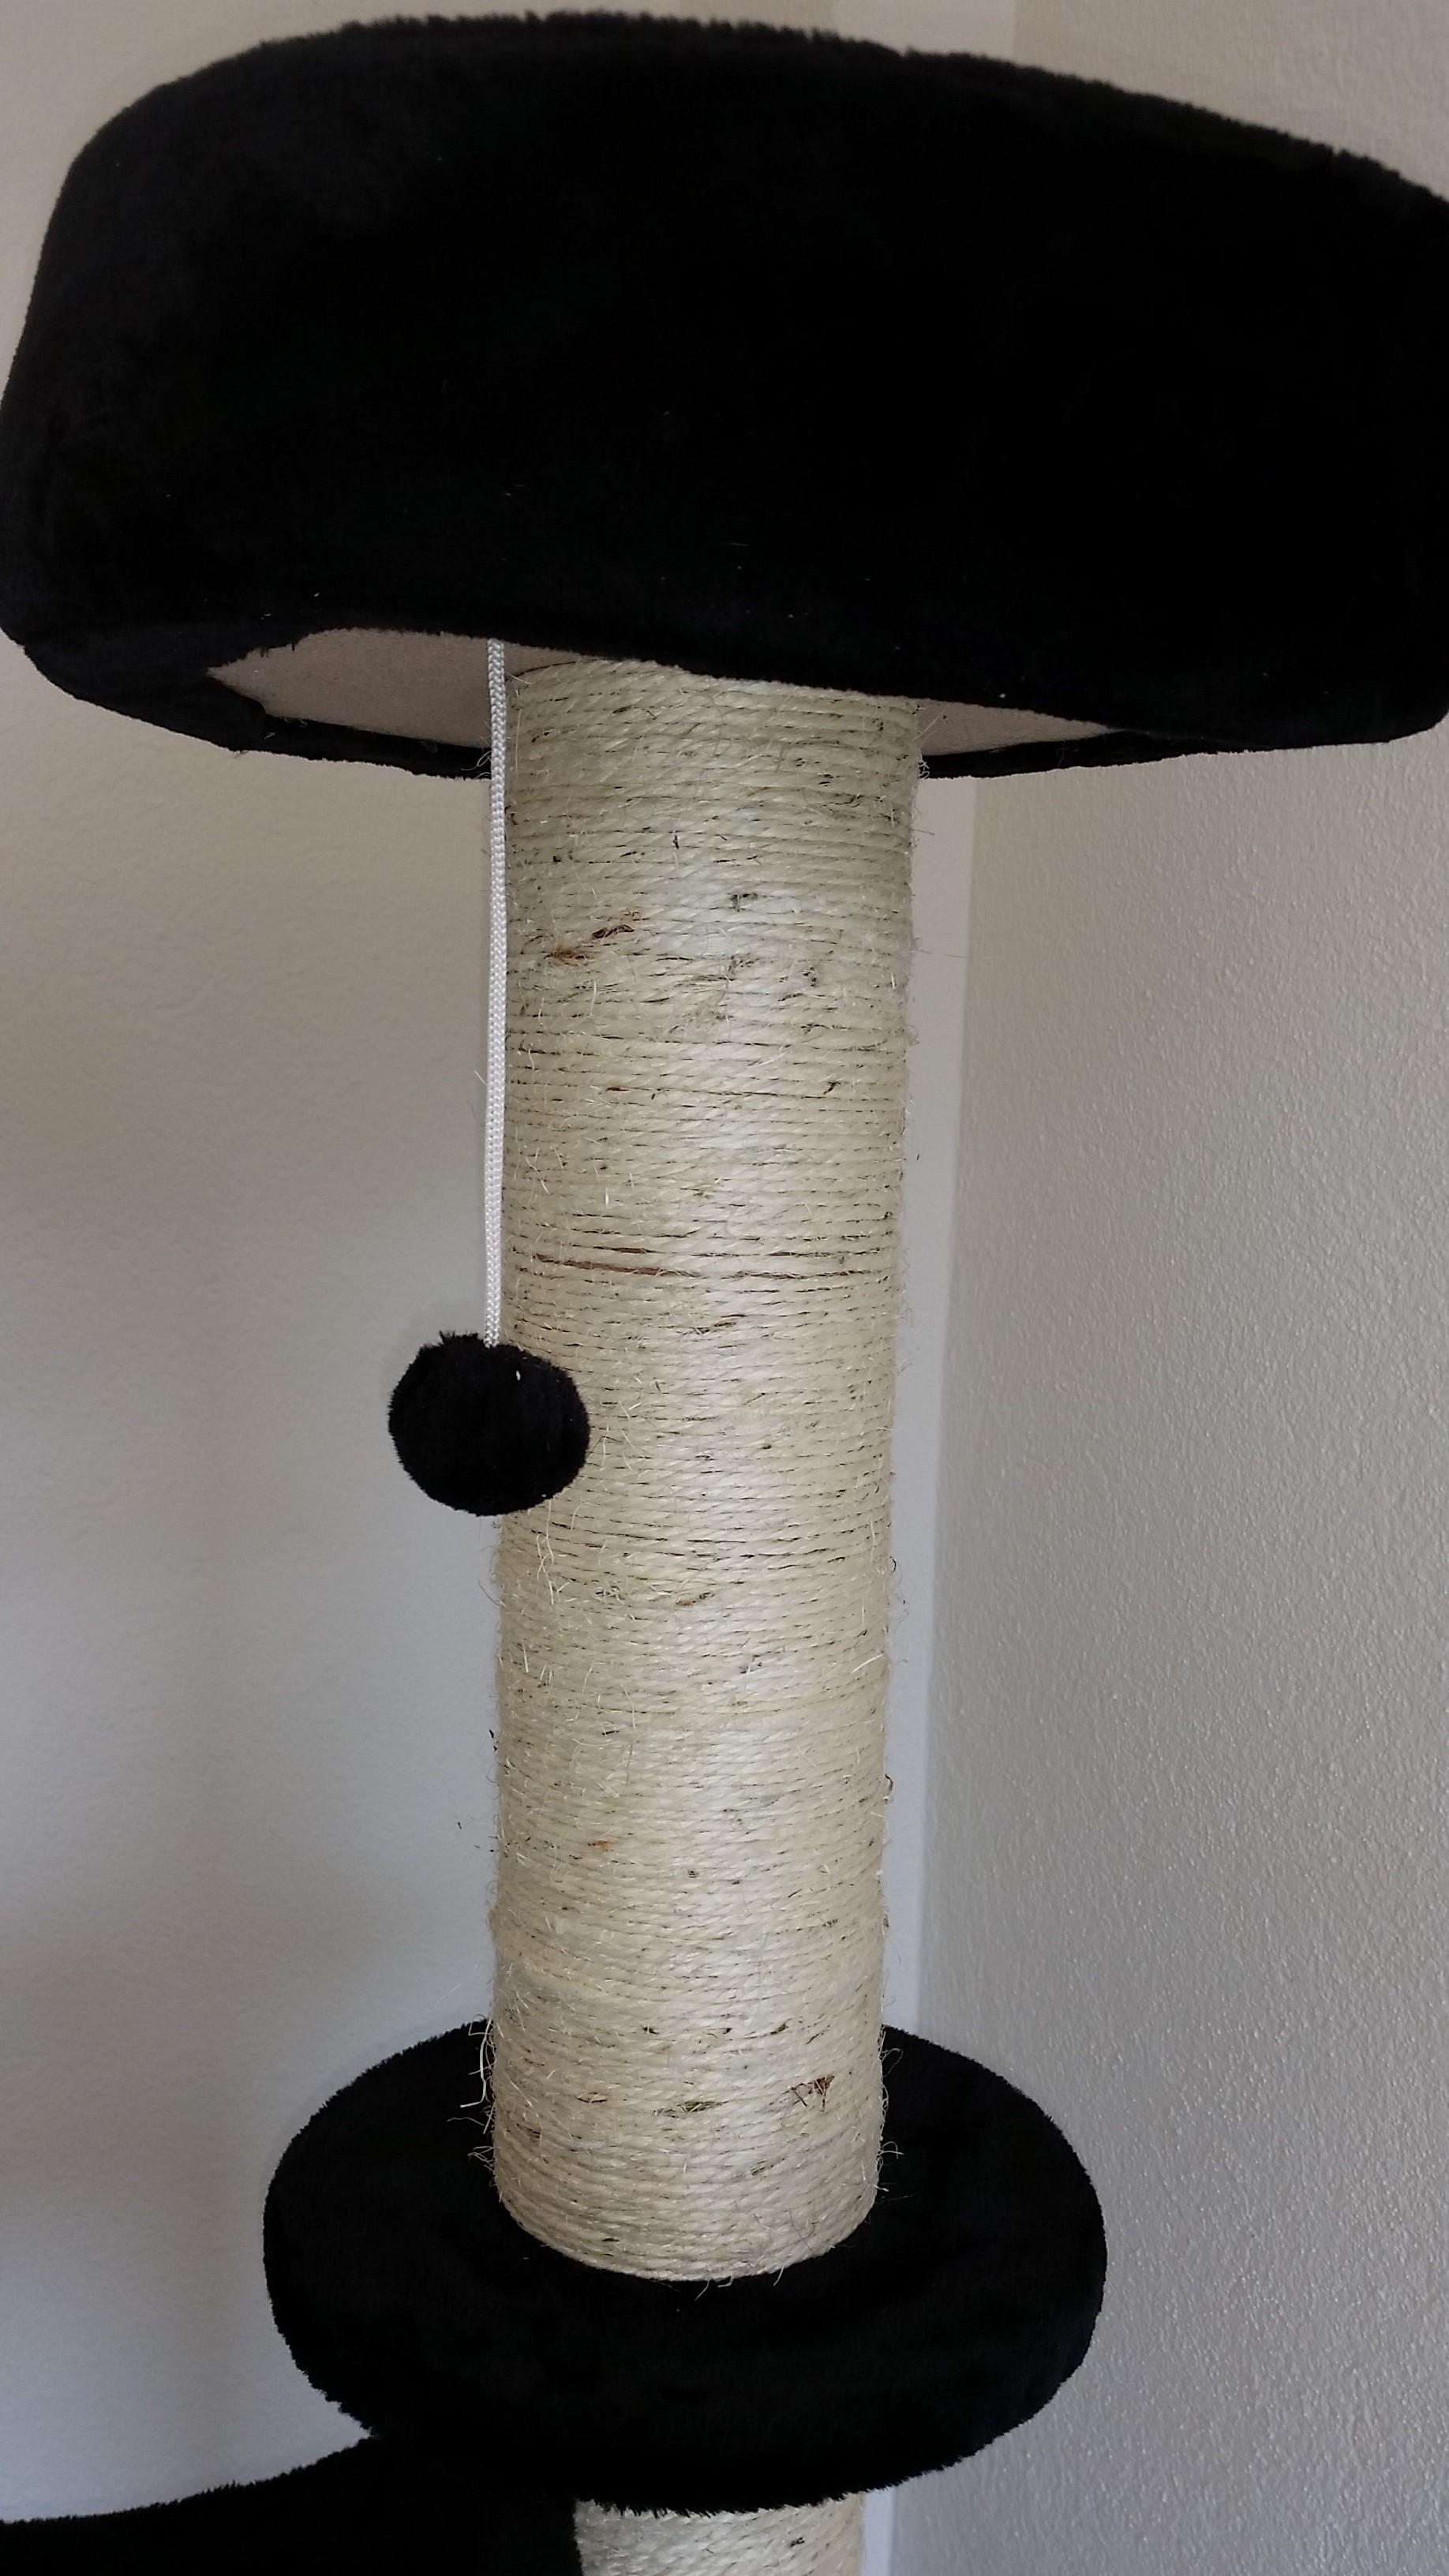 kratzbaum katzenbaum de luxe voco tiere. Black Bedroom Furniture Sets. Home Design Ideas